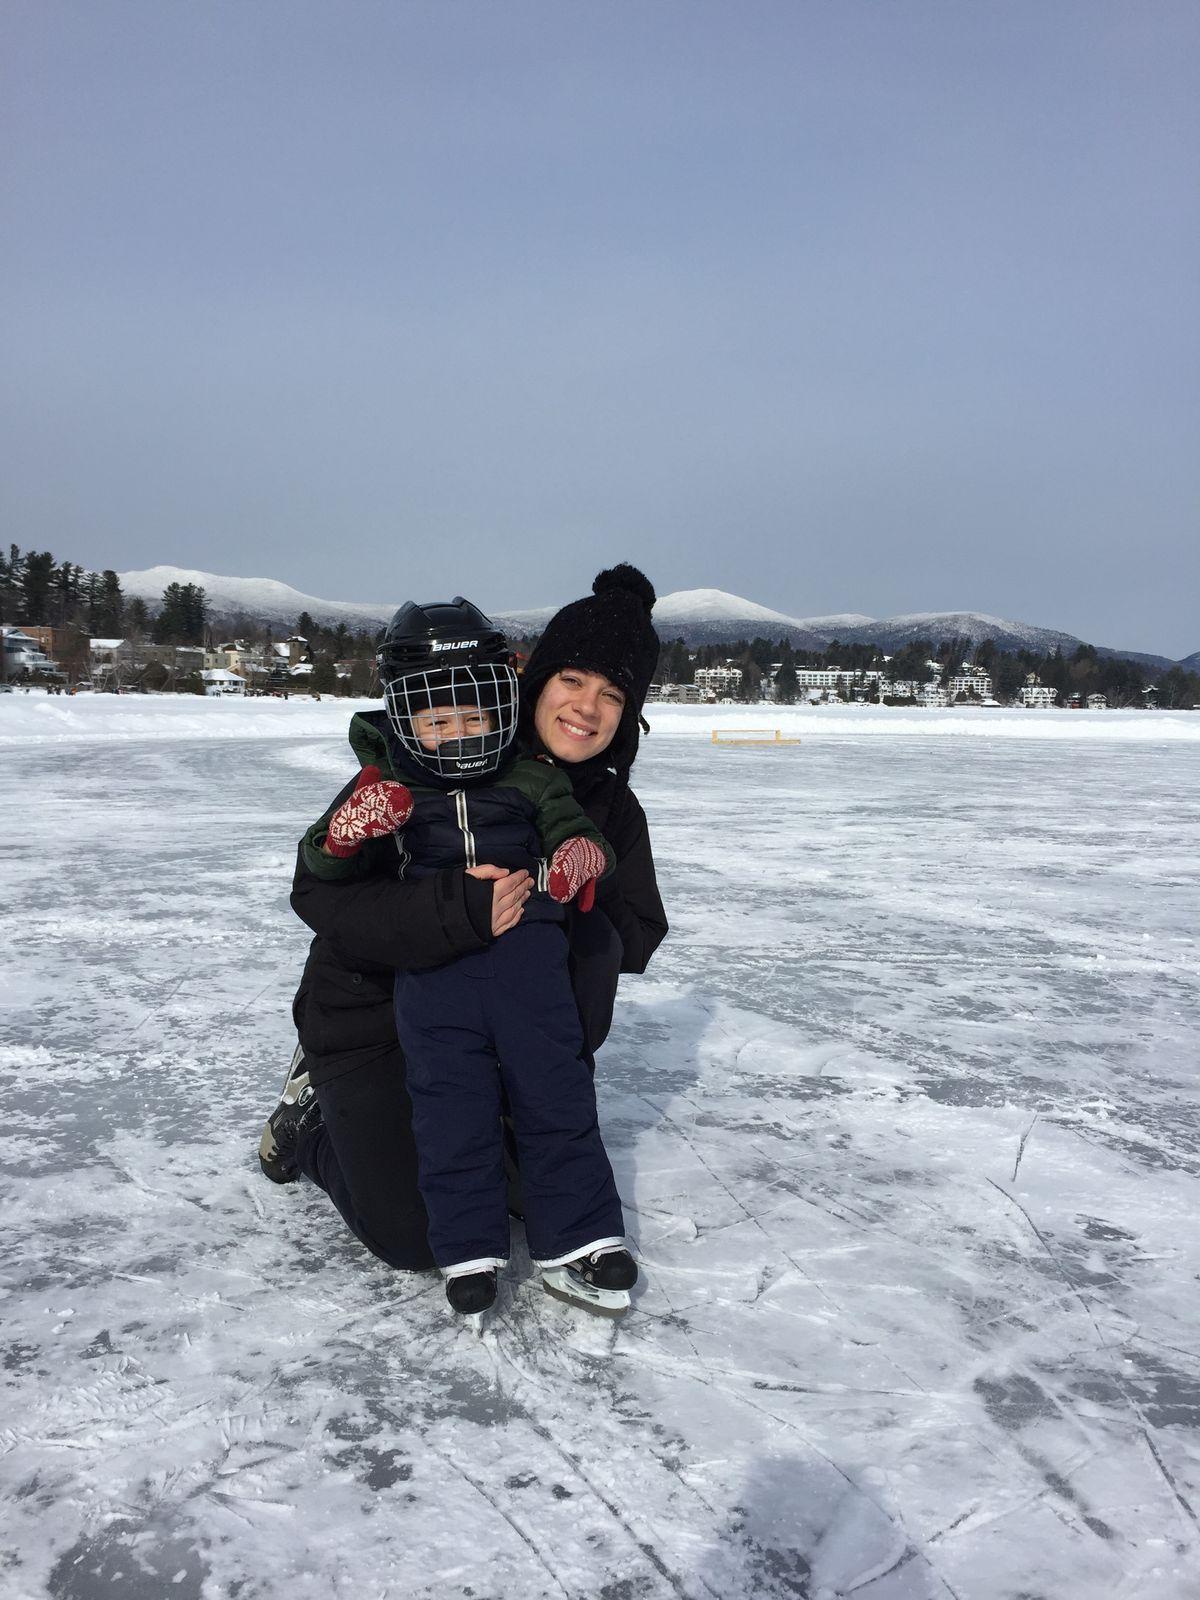 Kristen and Son